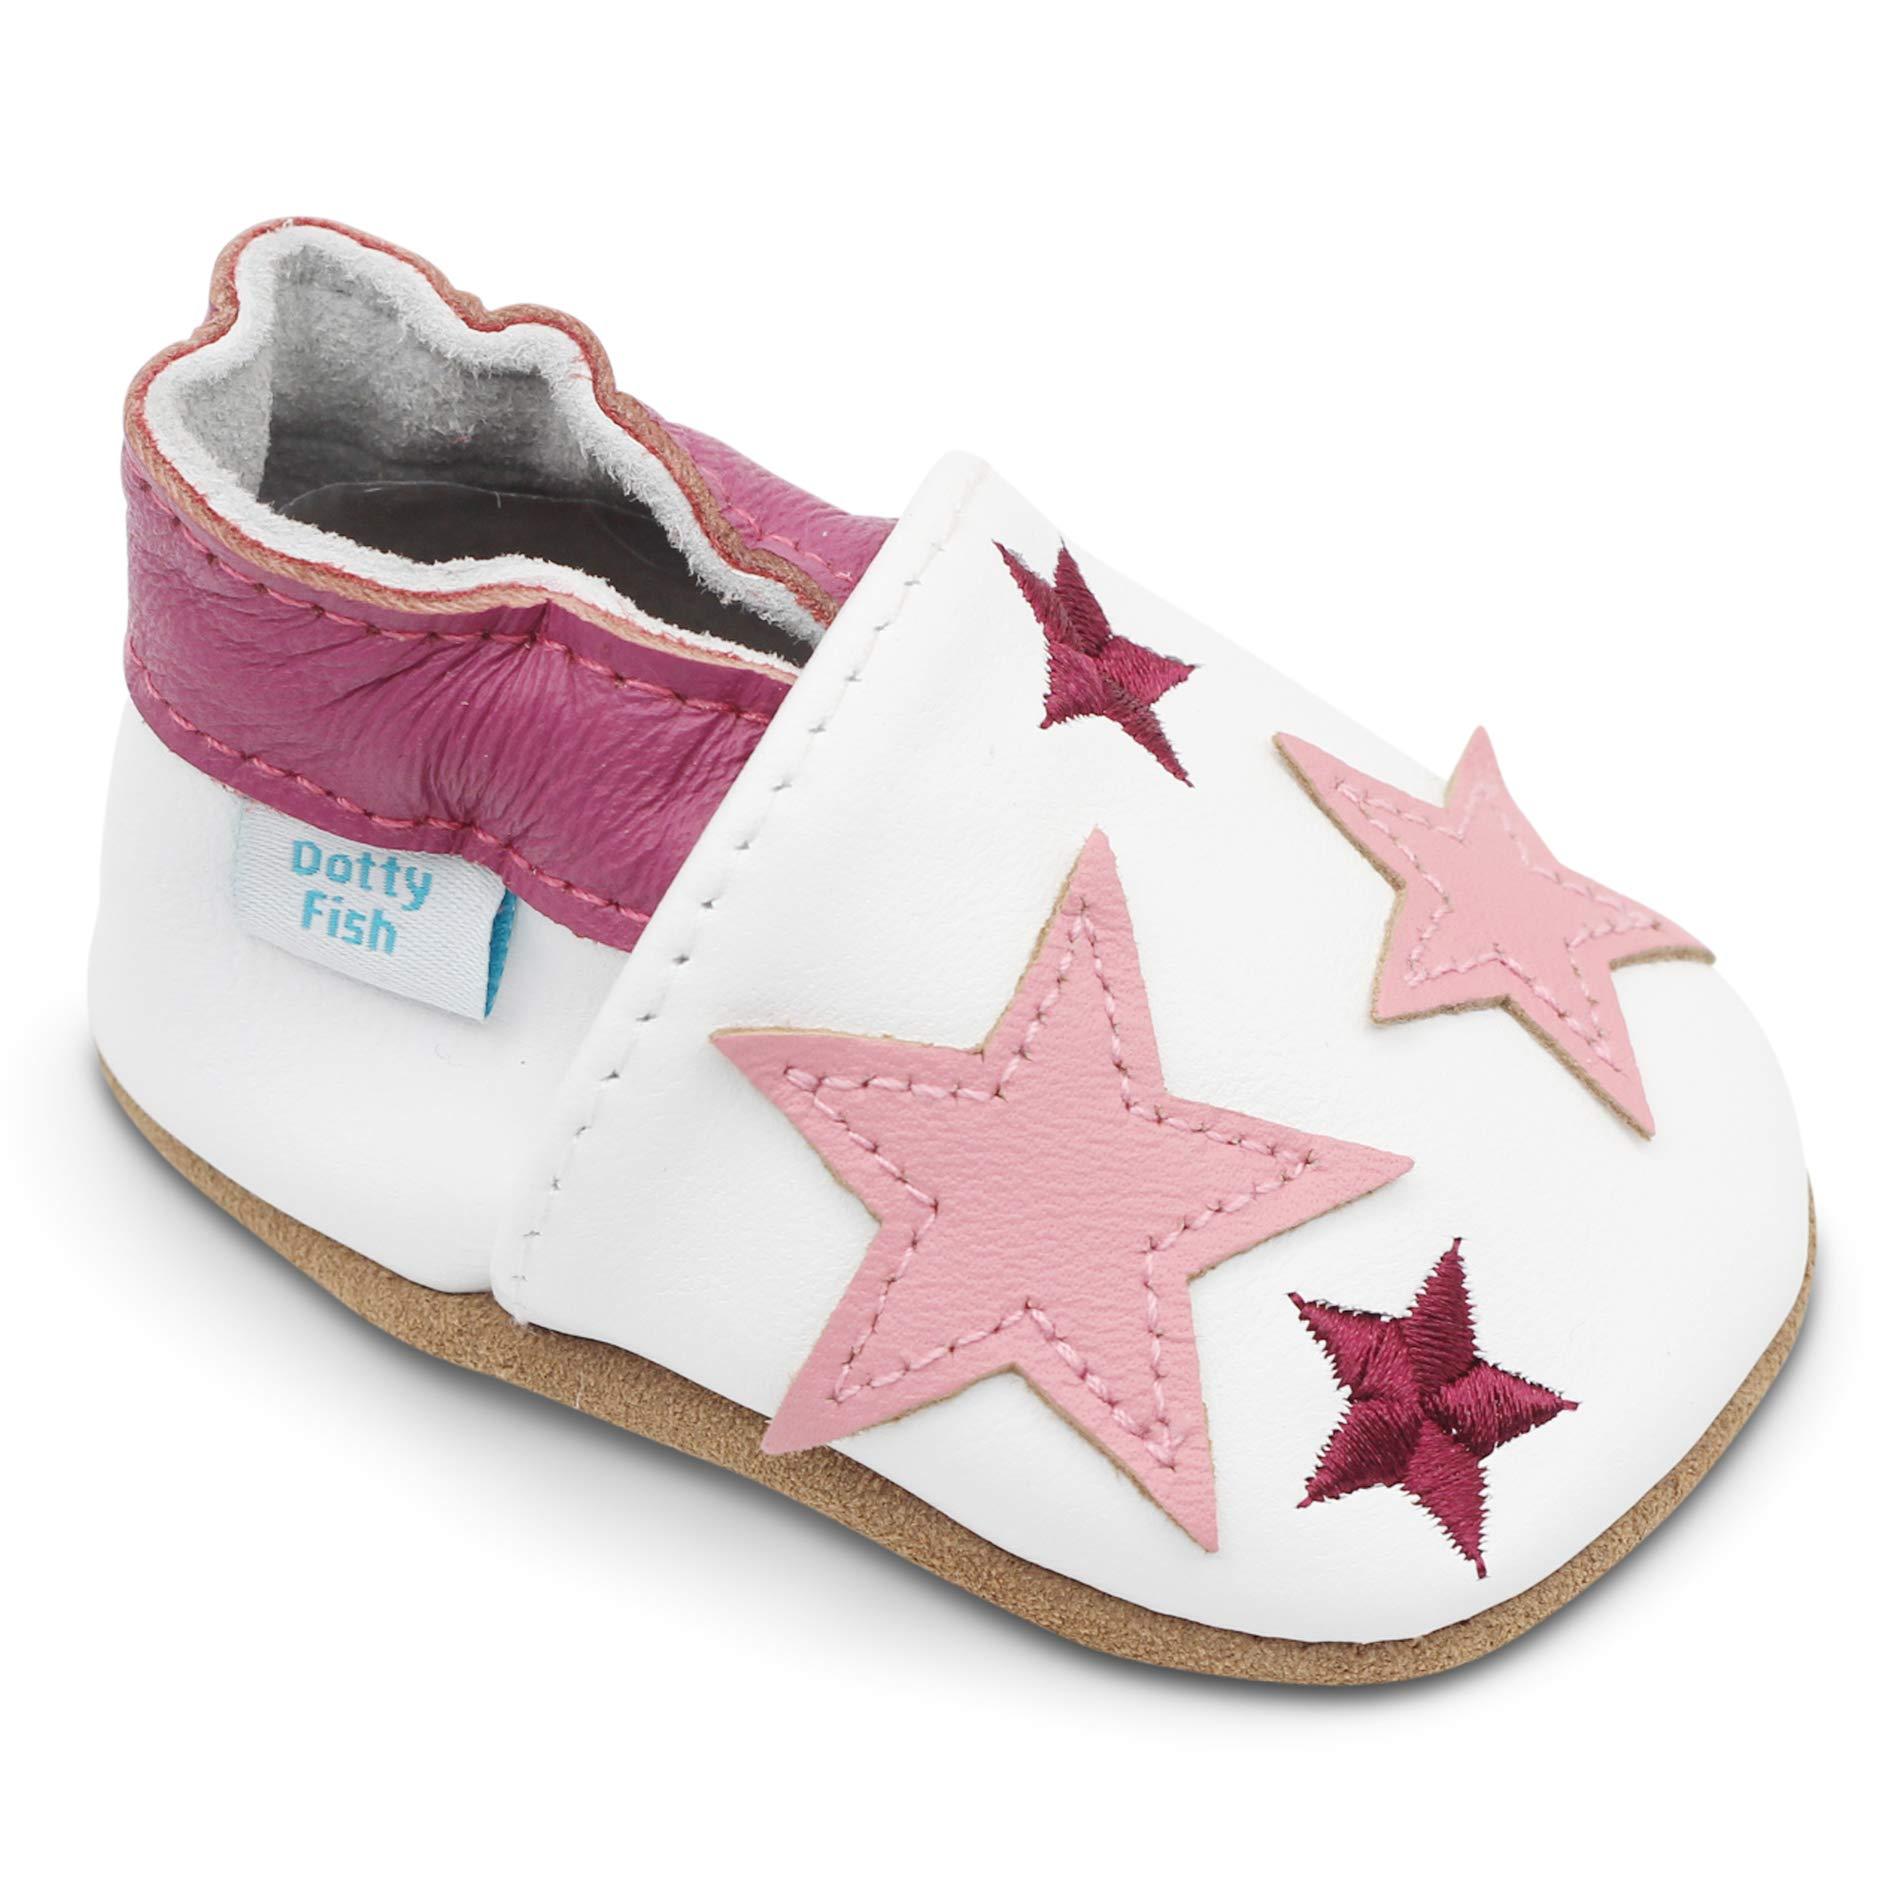 Dotty Fish Chaussures Cuir Souple bébé et Bambin. 0-6 Mois - 4- 0e48ff30a94